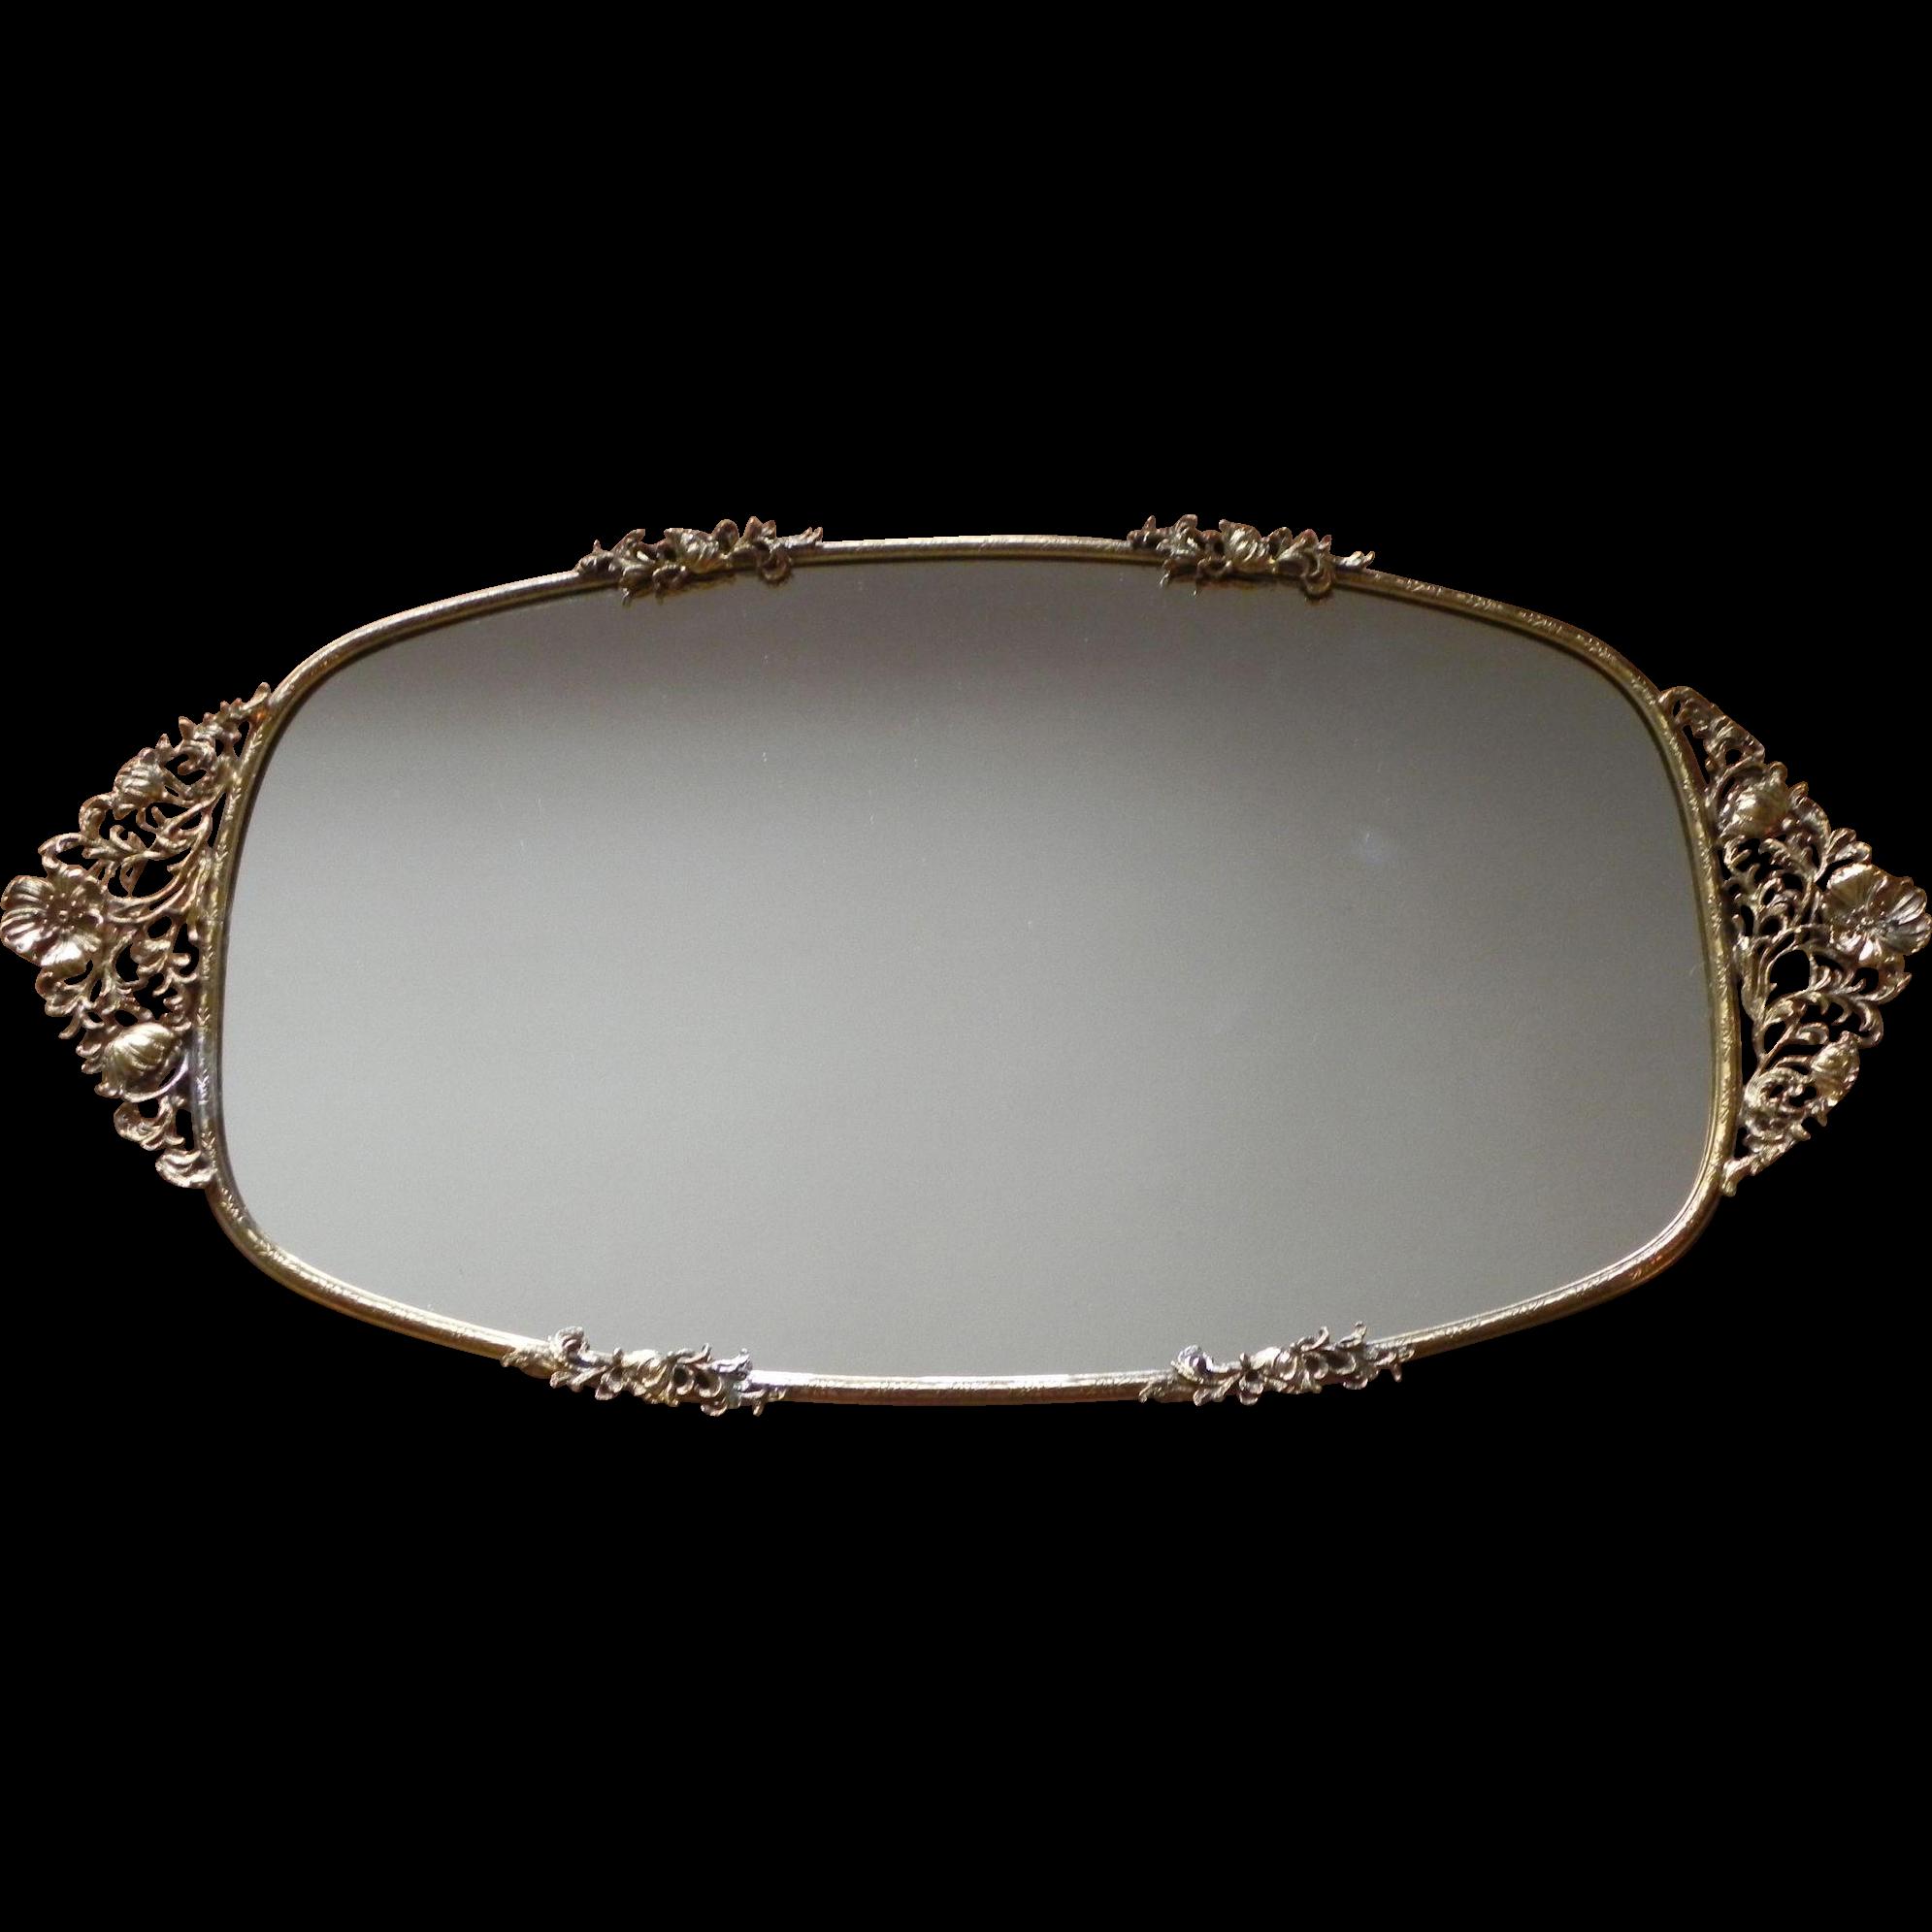 Mirrored tray for bathroom - Rare Large Signed Matson Poppy Perfume Vanity Mirror Tray Ormolu